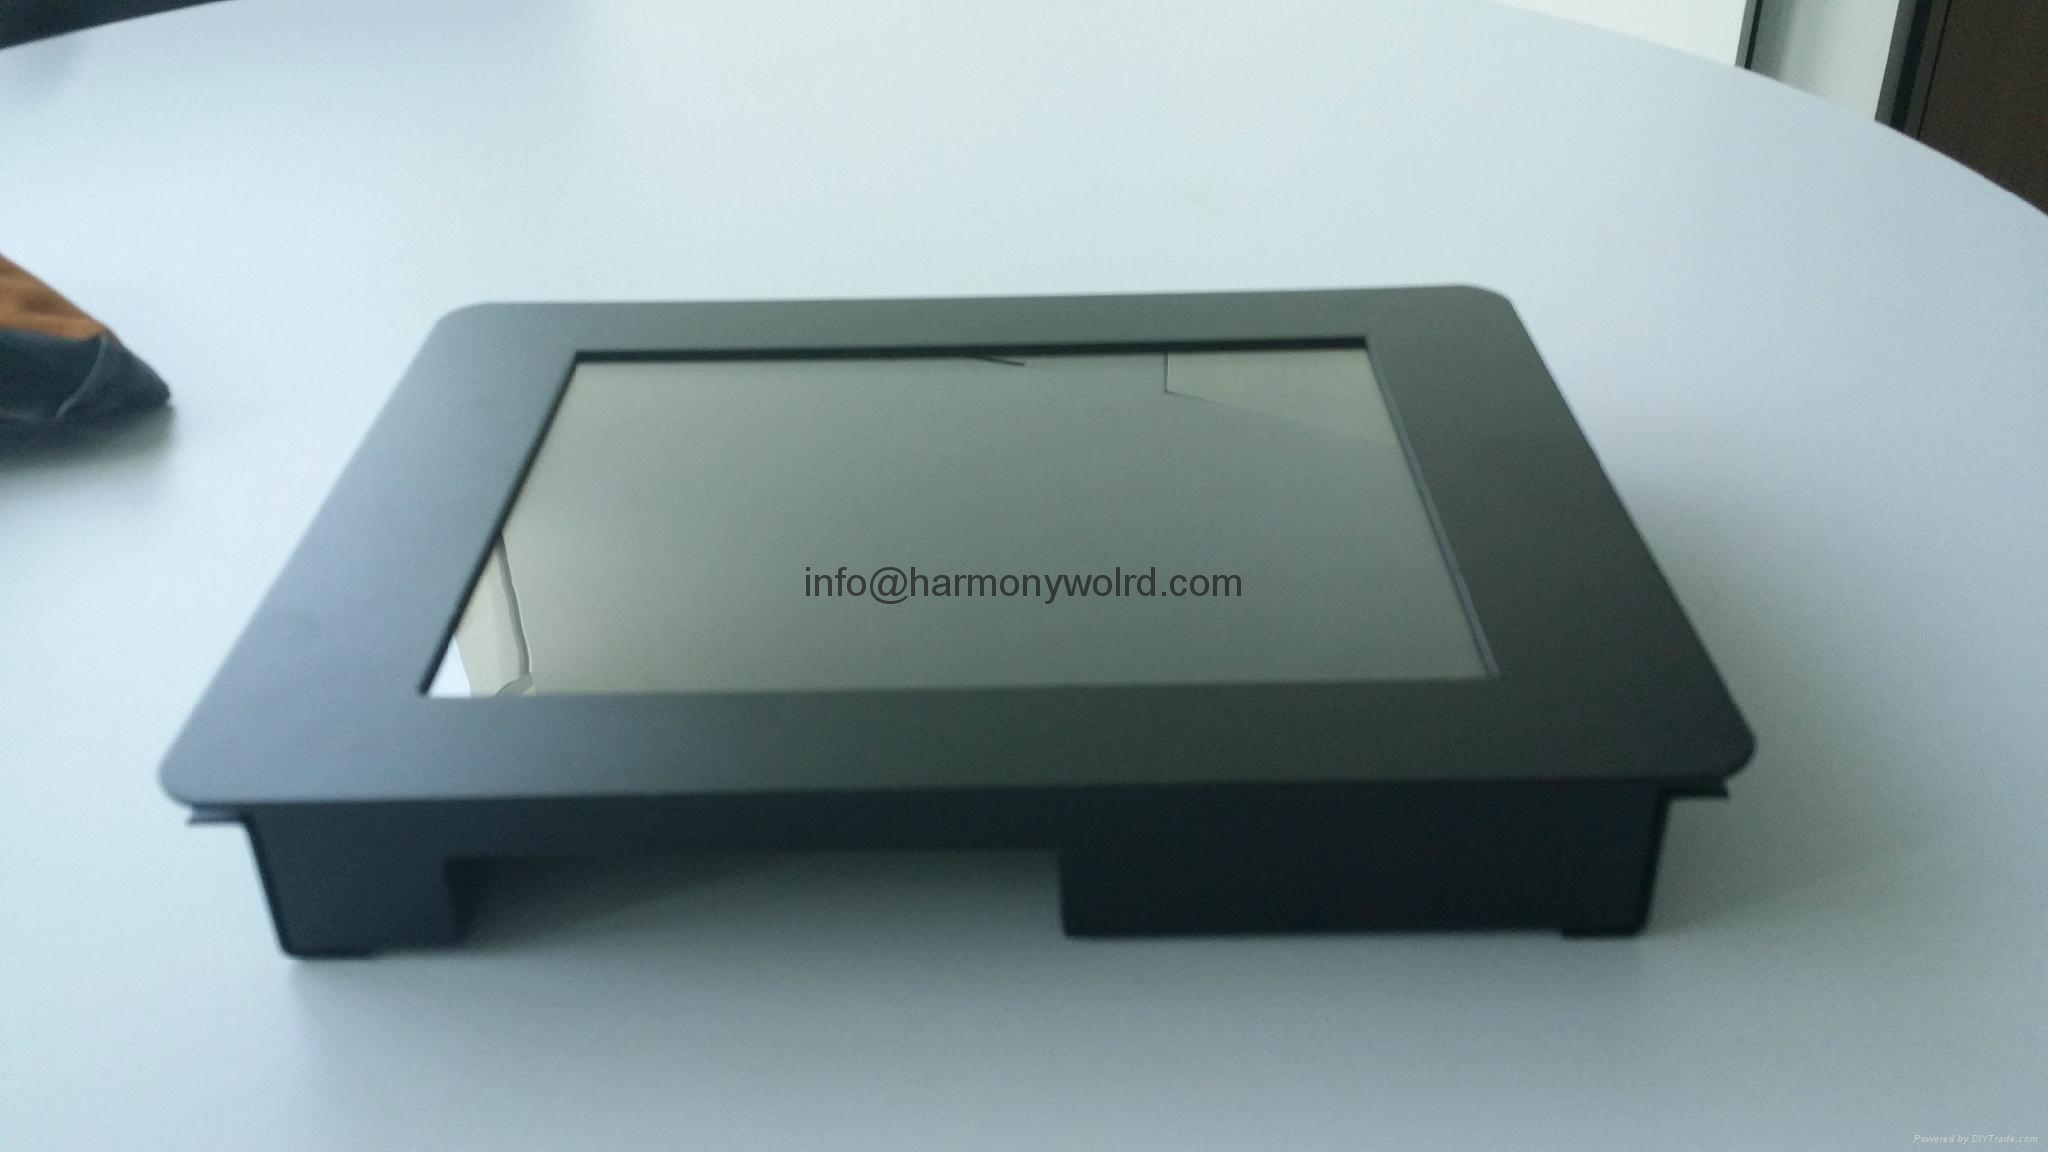 Upgrade A/B 324-50109A 38-K21ILA-OP 5000C-AC-0-0 916724-01 CM1210-01 CRT To LCDs 8